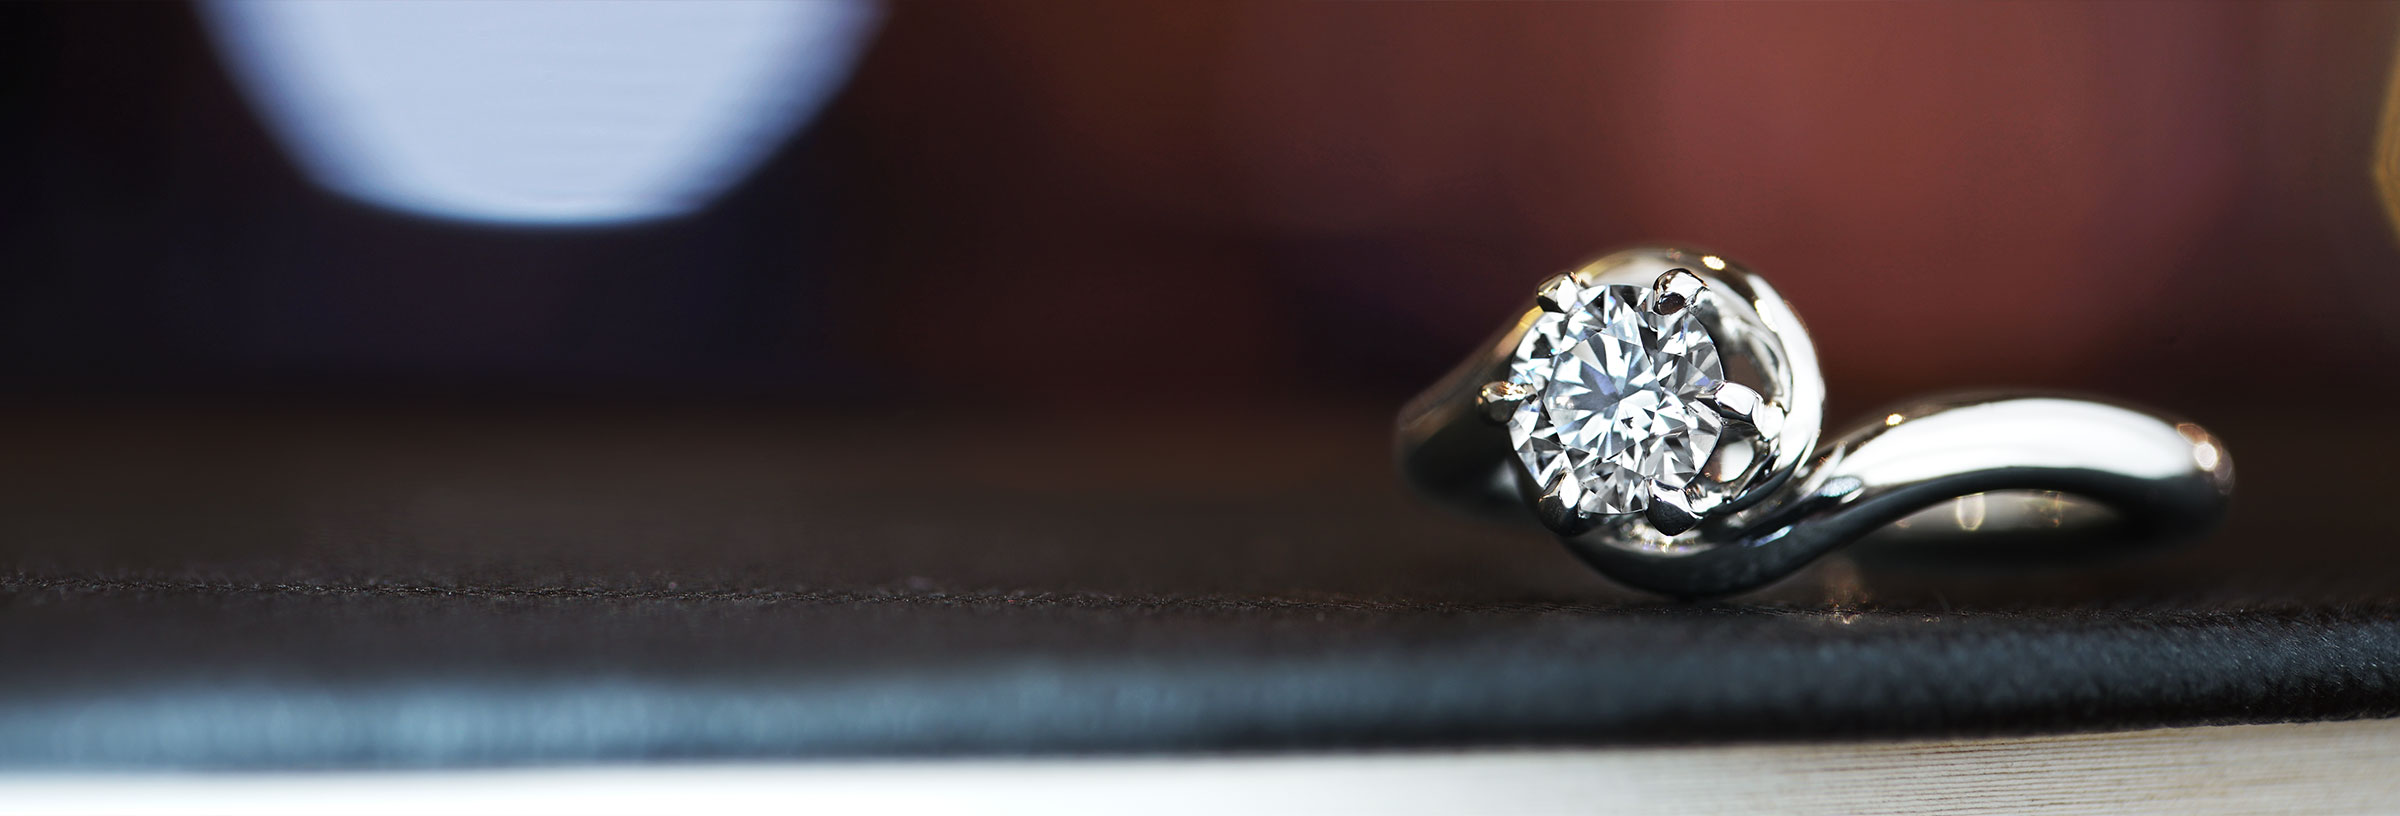 Palladium and Diamond twisting engagement ring